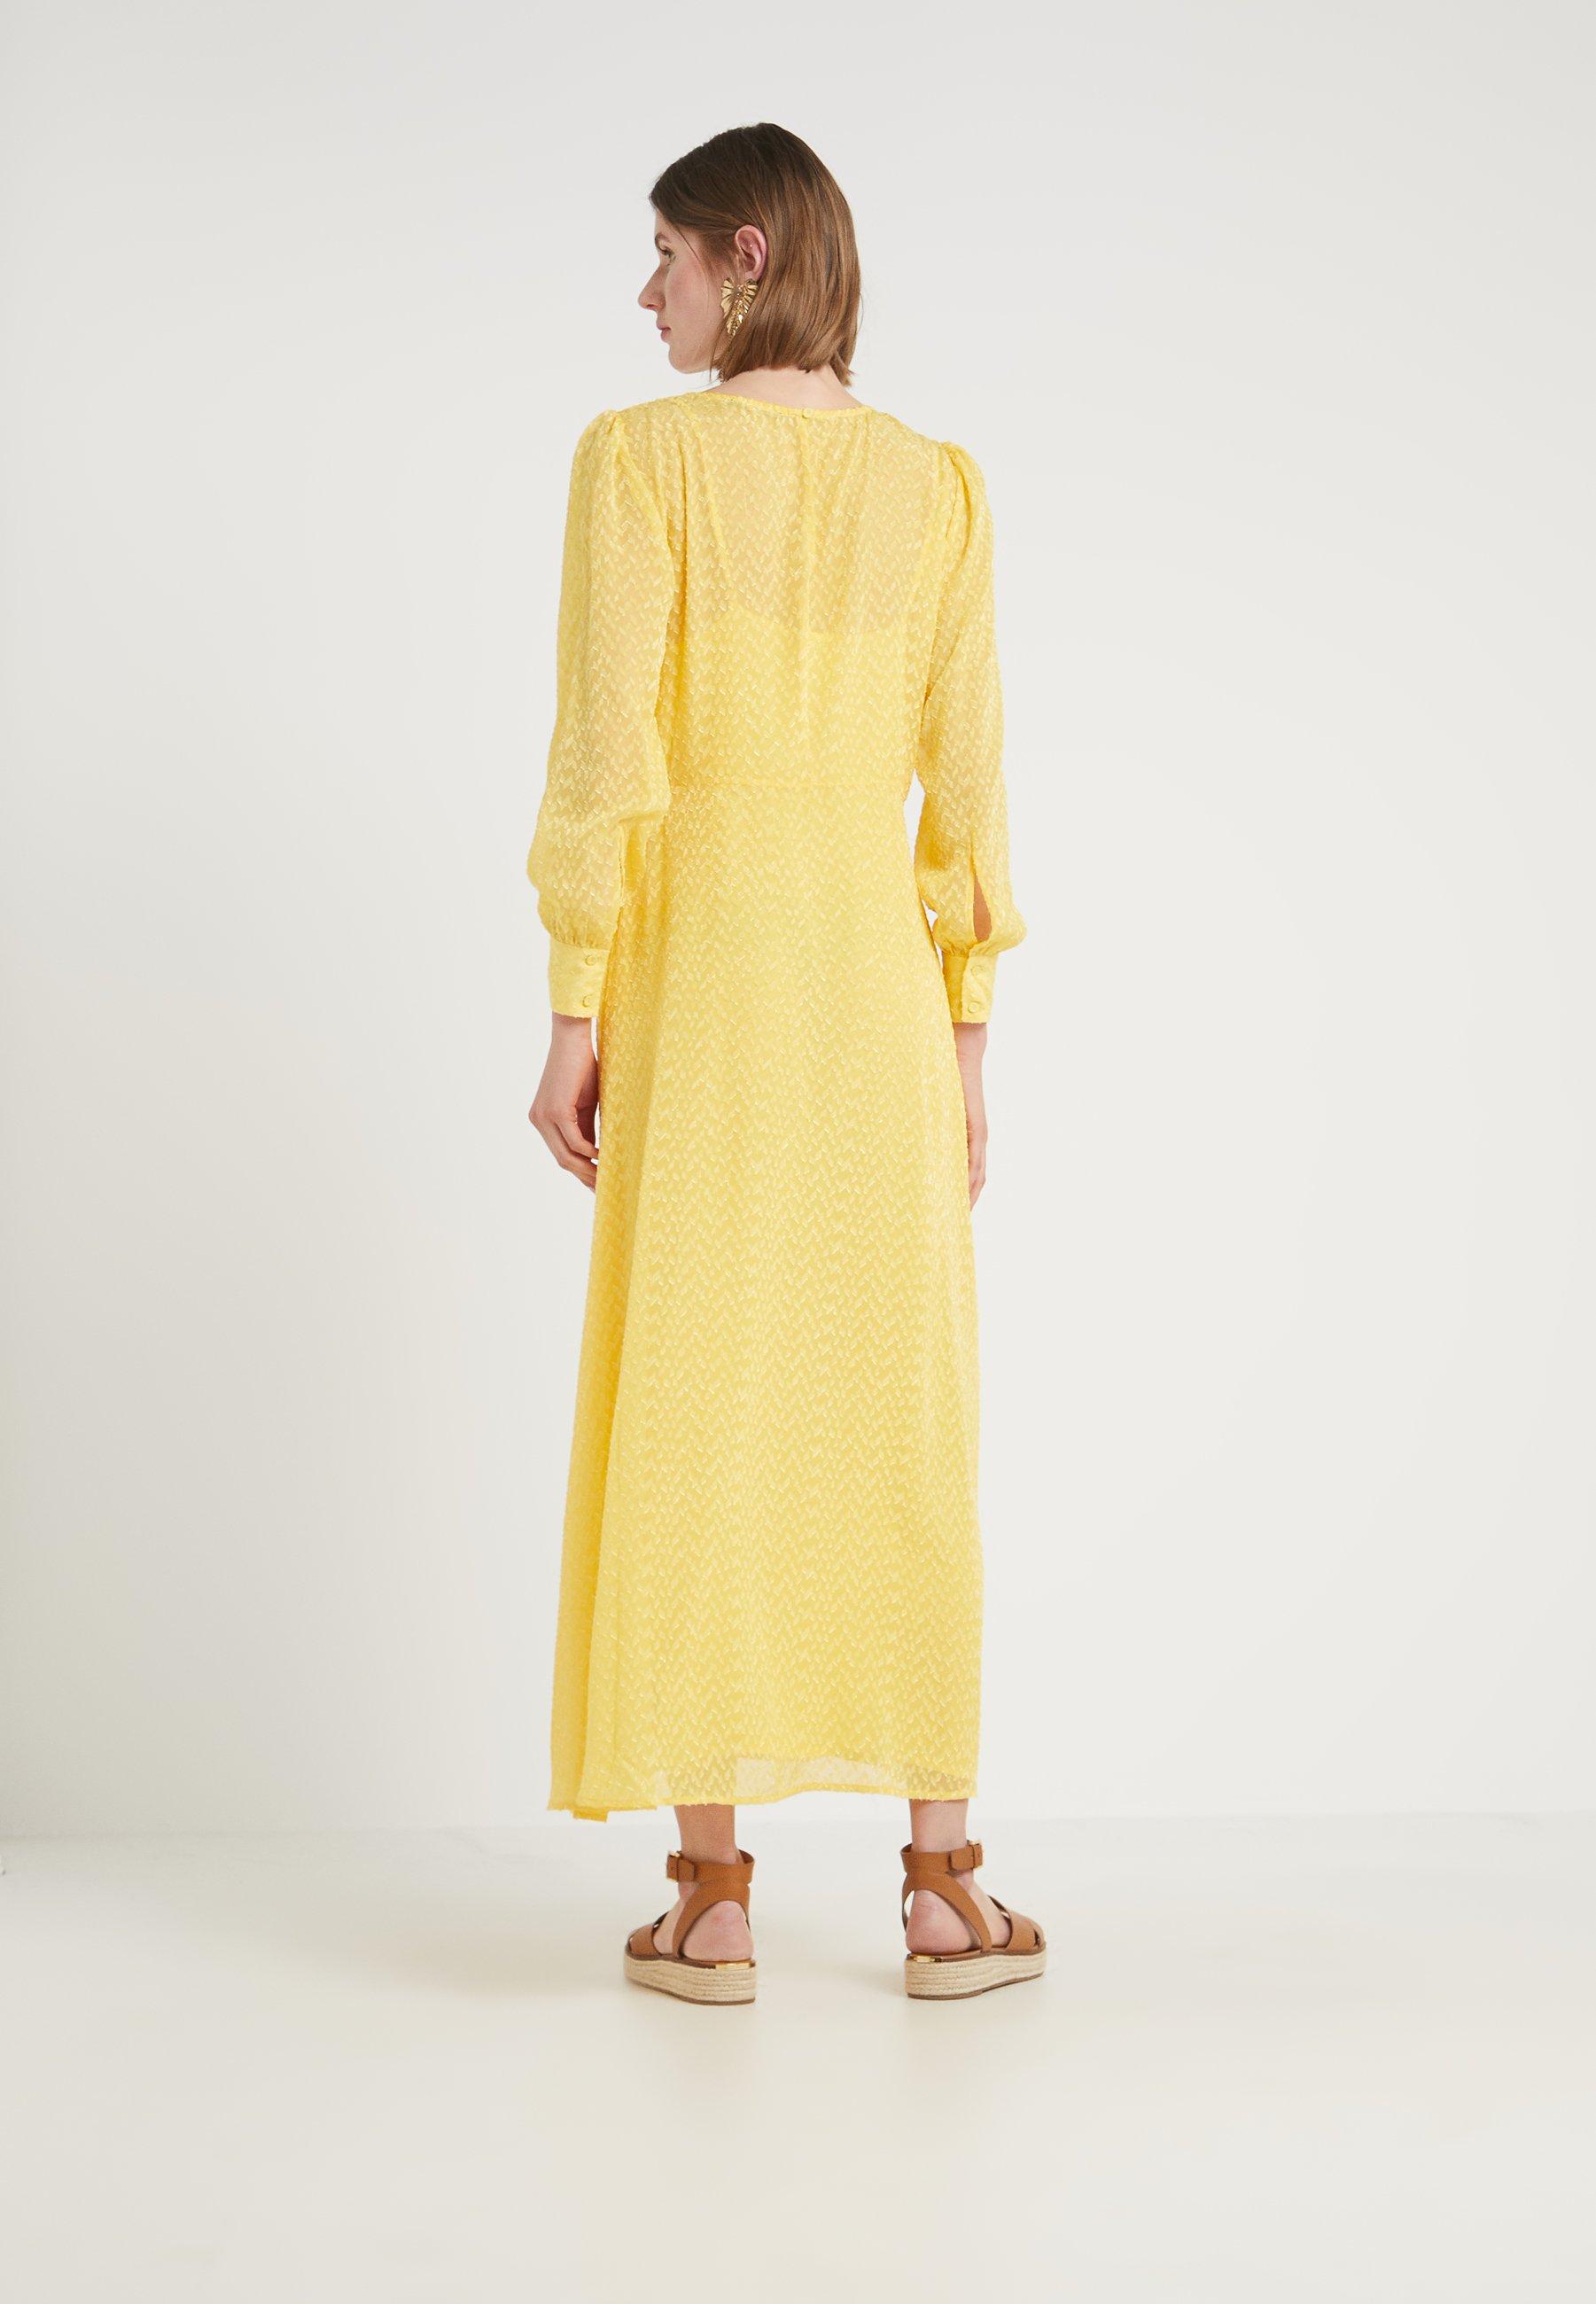 DressRobe Longue Yellow Peachy Bruuns Luzia Zilke Bazaar IYf6gyv7b